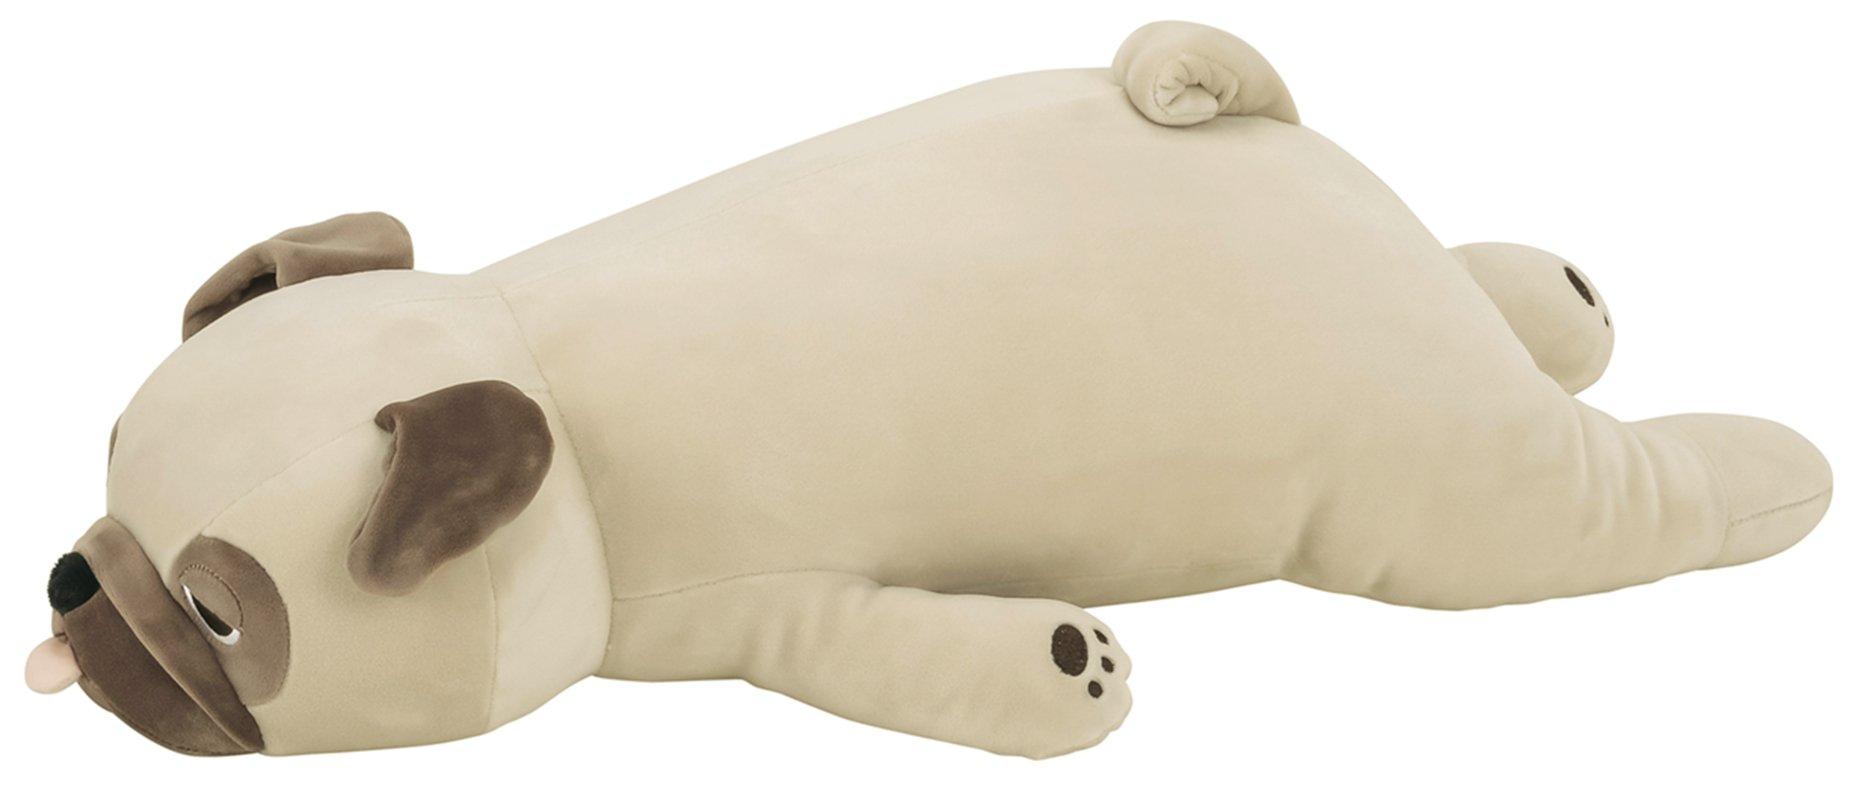 LivHeart Premium Nemu Nemu Sleepy head Animals Body Pillow Beige Plush Dog Pug 'Hana' size M (22''x9''x5'') Japan import 48769-32 Huggable Super Soft Stuffed Toy